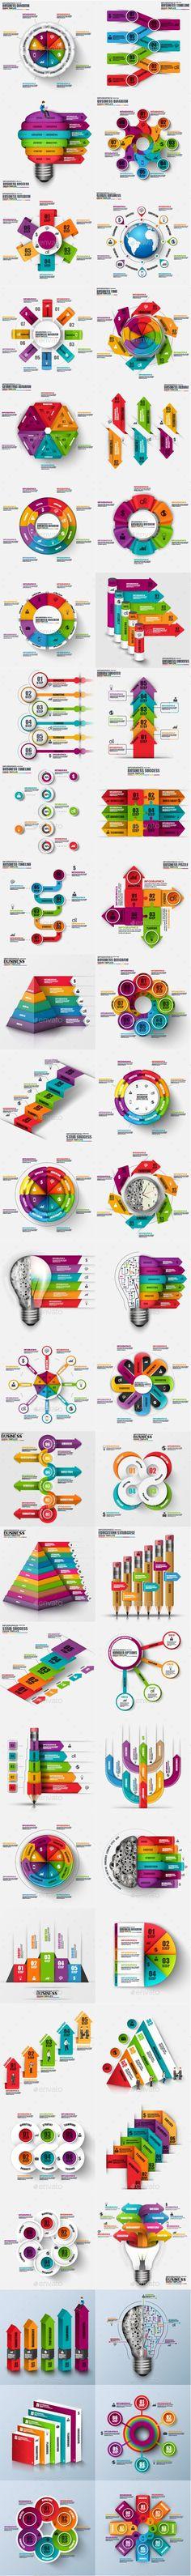 Big Bundle Infographic Templates Vector EPS, AI Illustrator